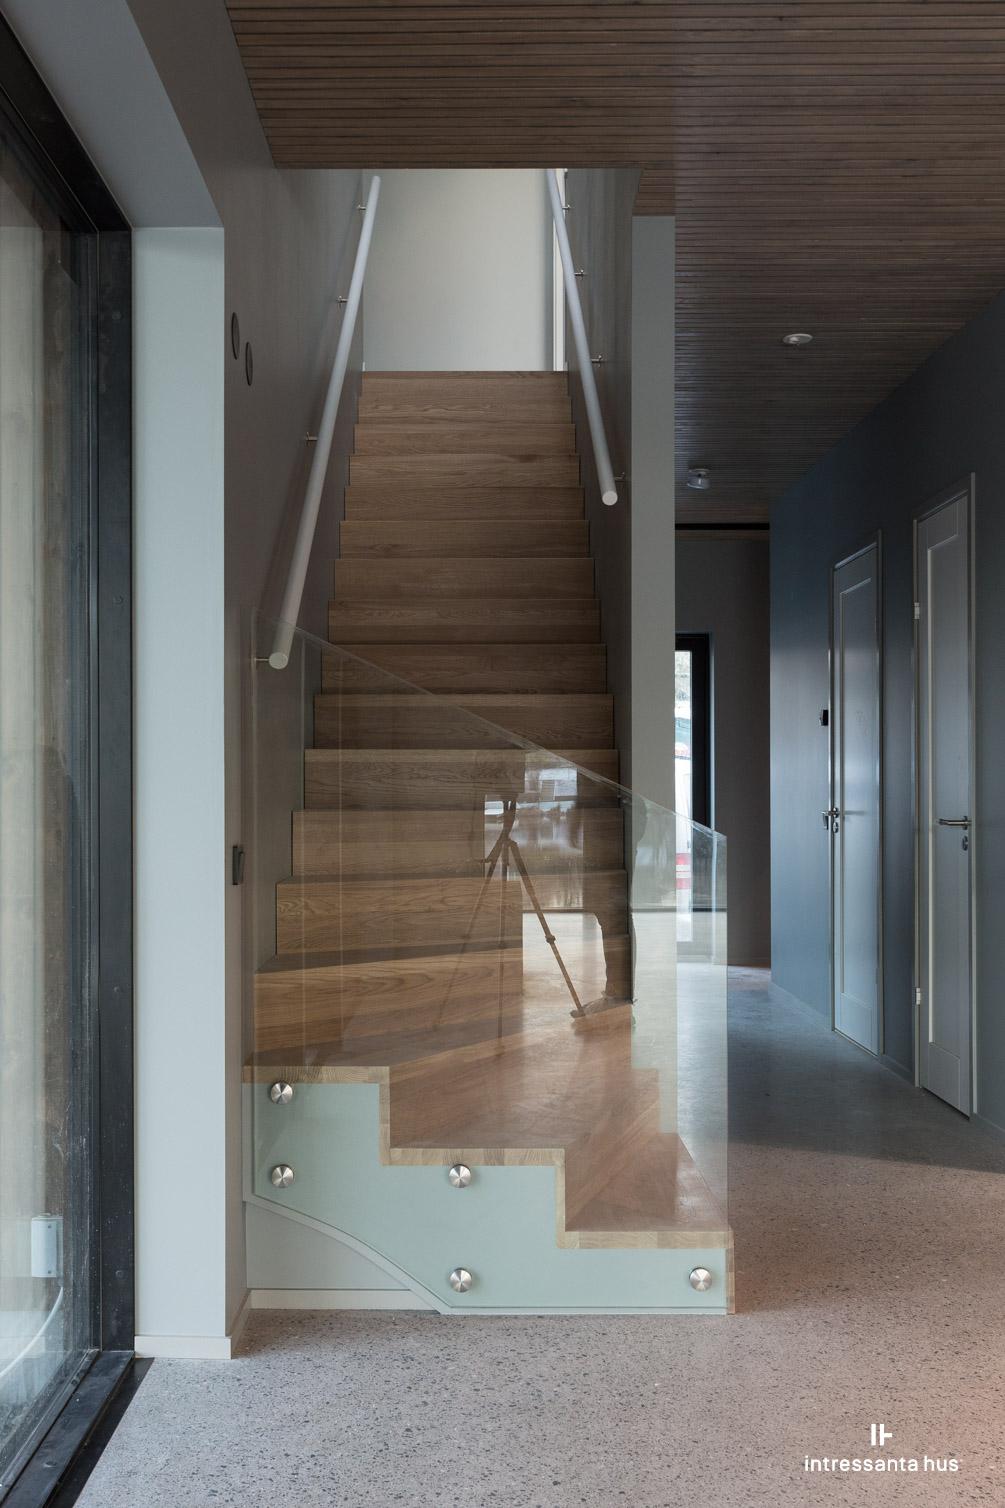 intressantahus-house1-079